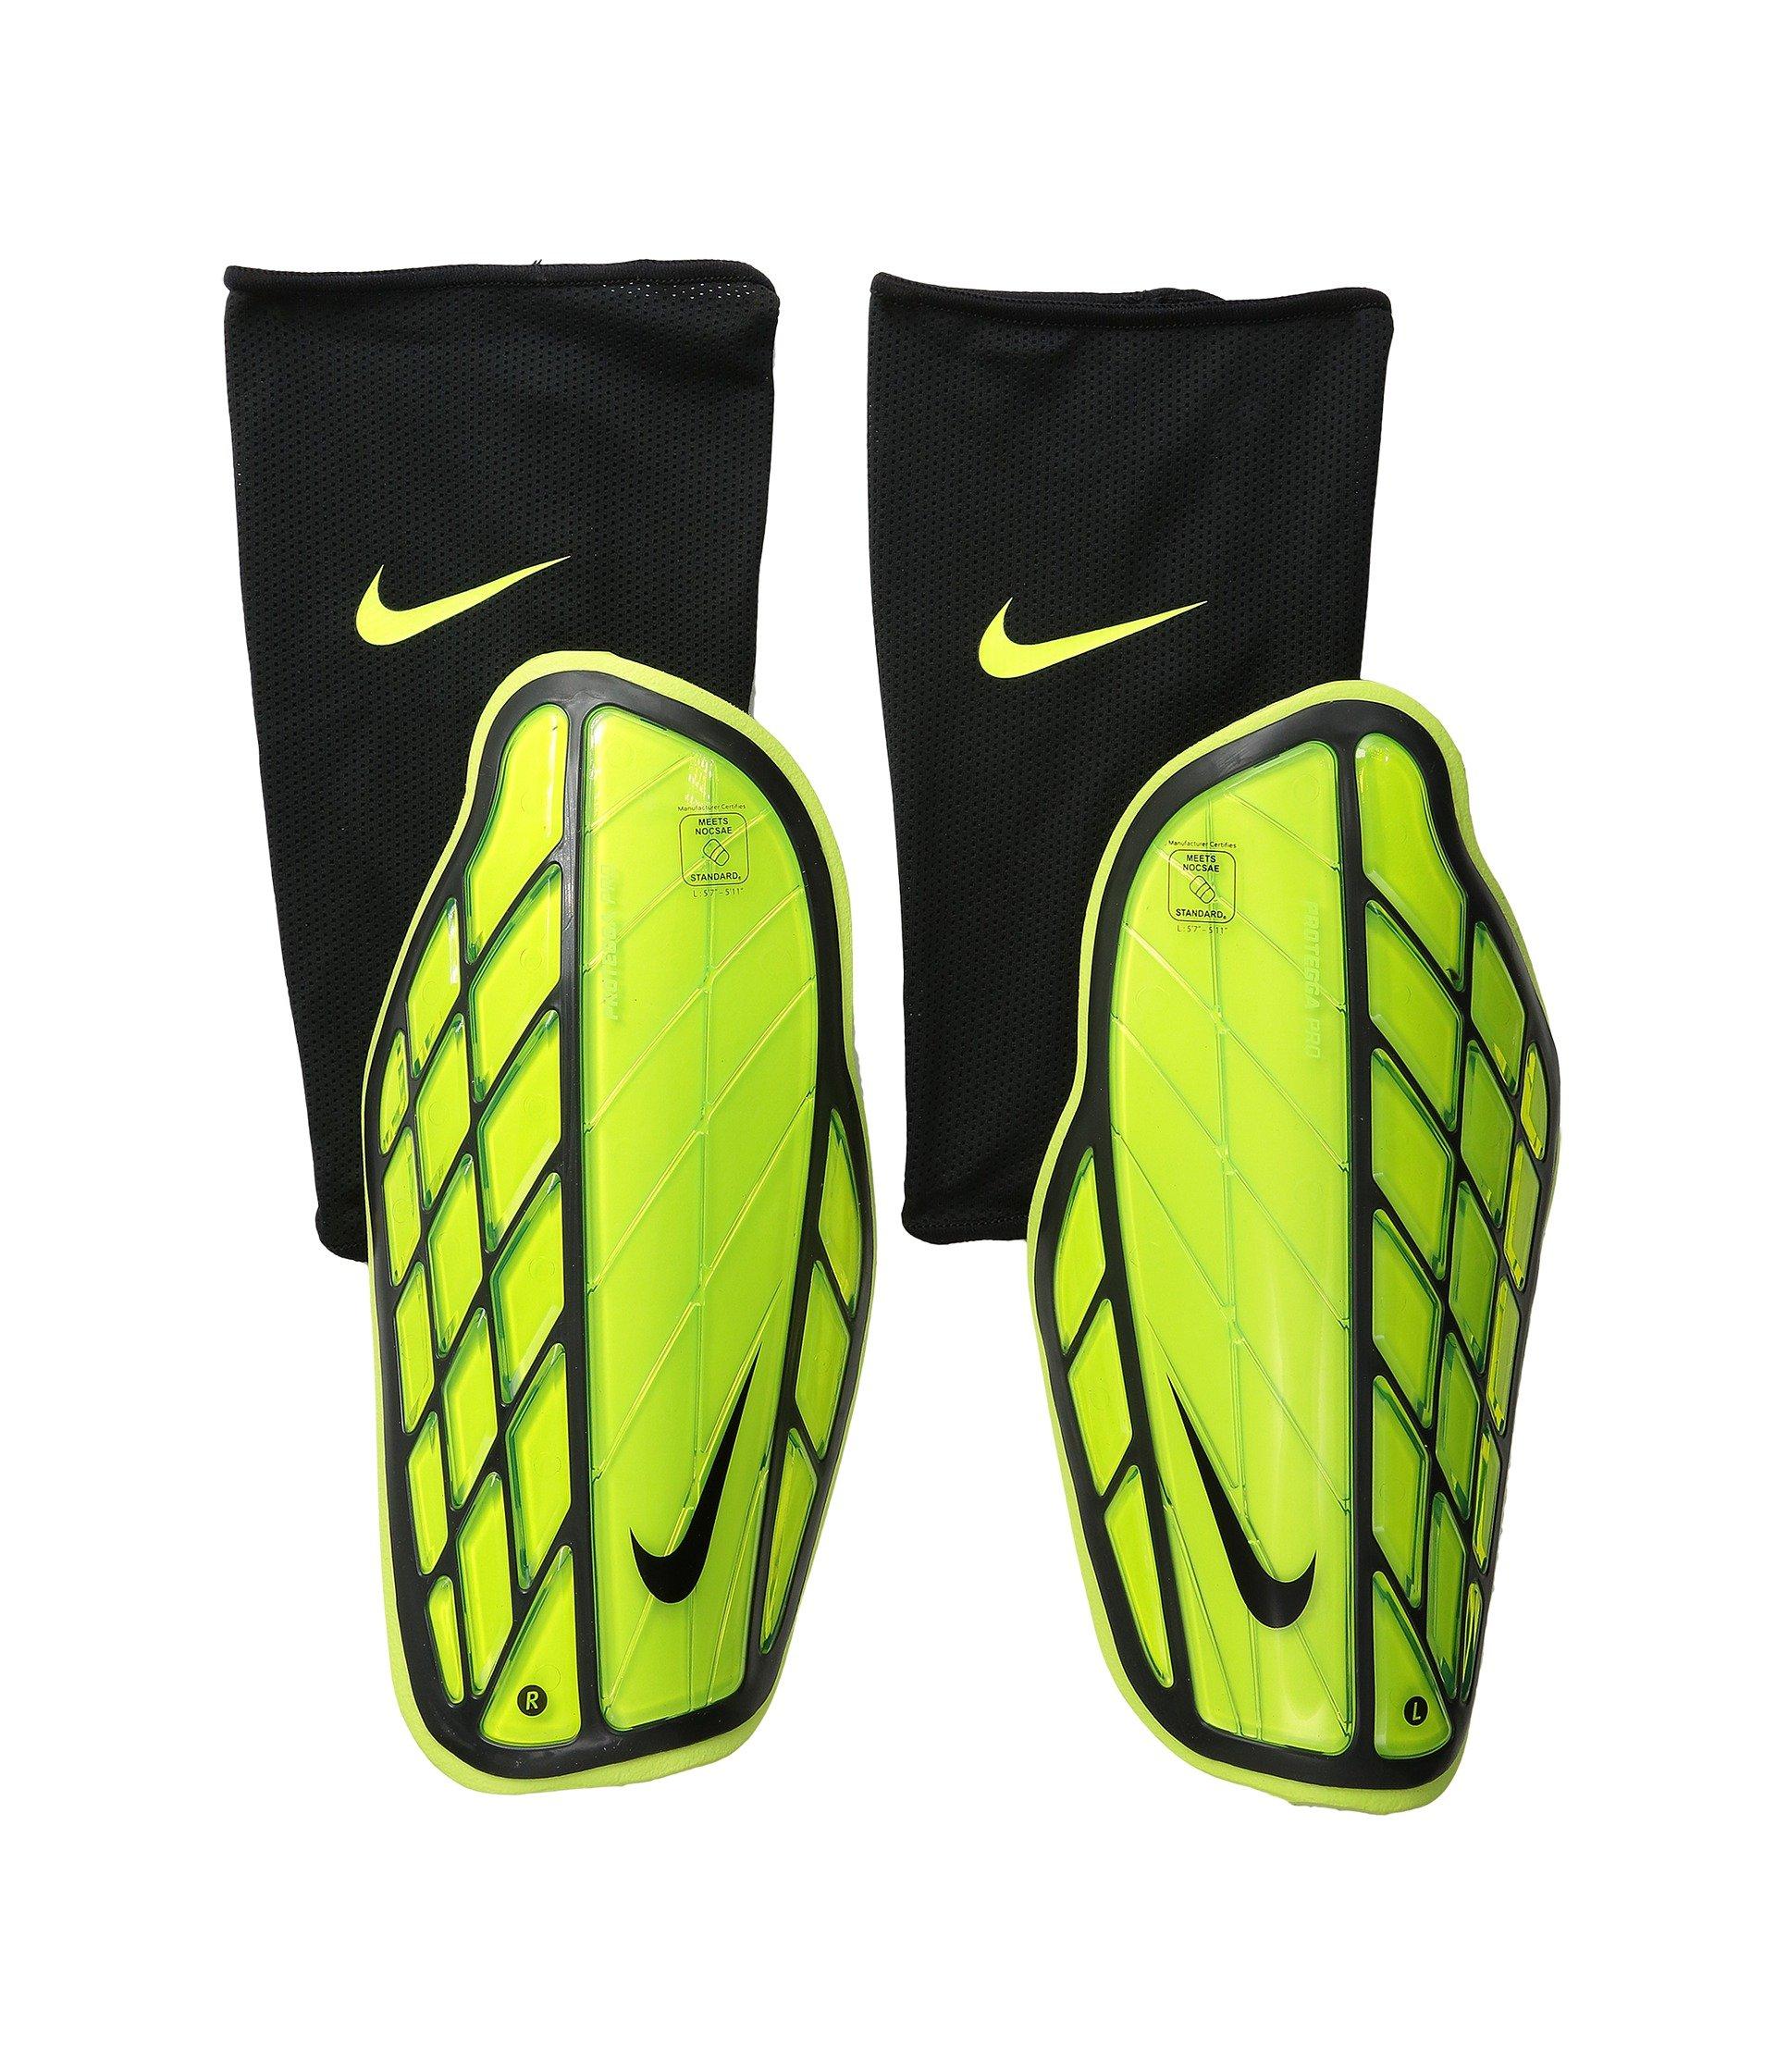 Accesorios Nike Attack Premium  + Nike en VeoyCompro.net